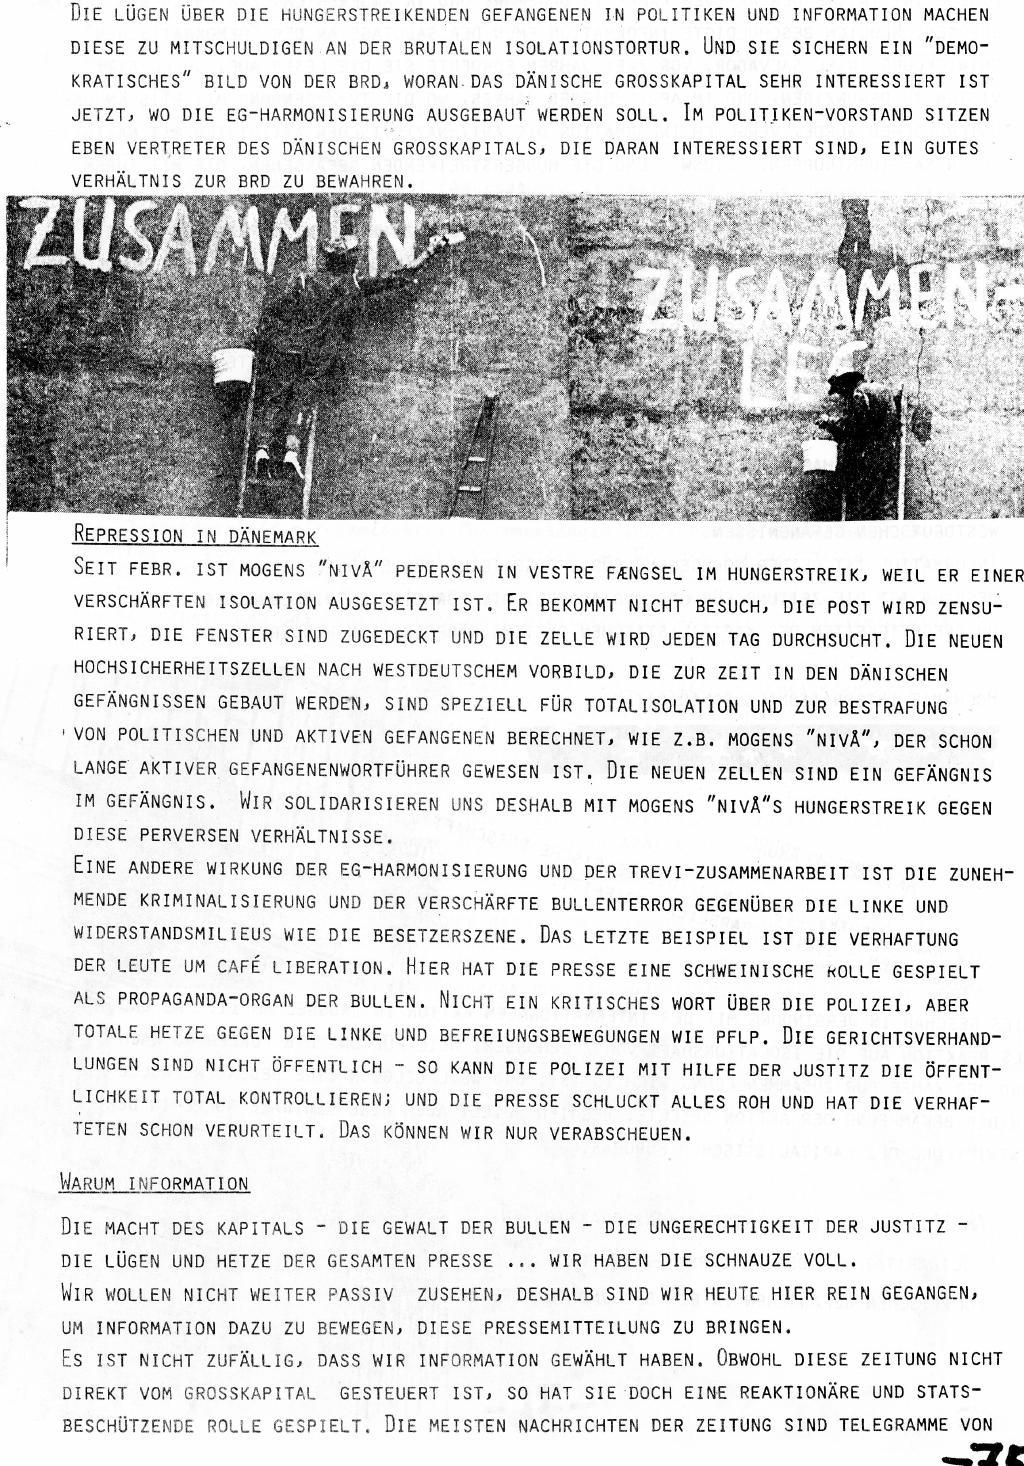 Belgien_Doku_Besetzung_EG_Kommission_1989_077